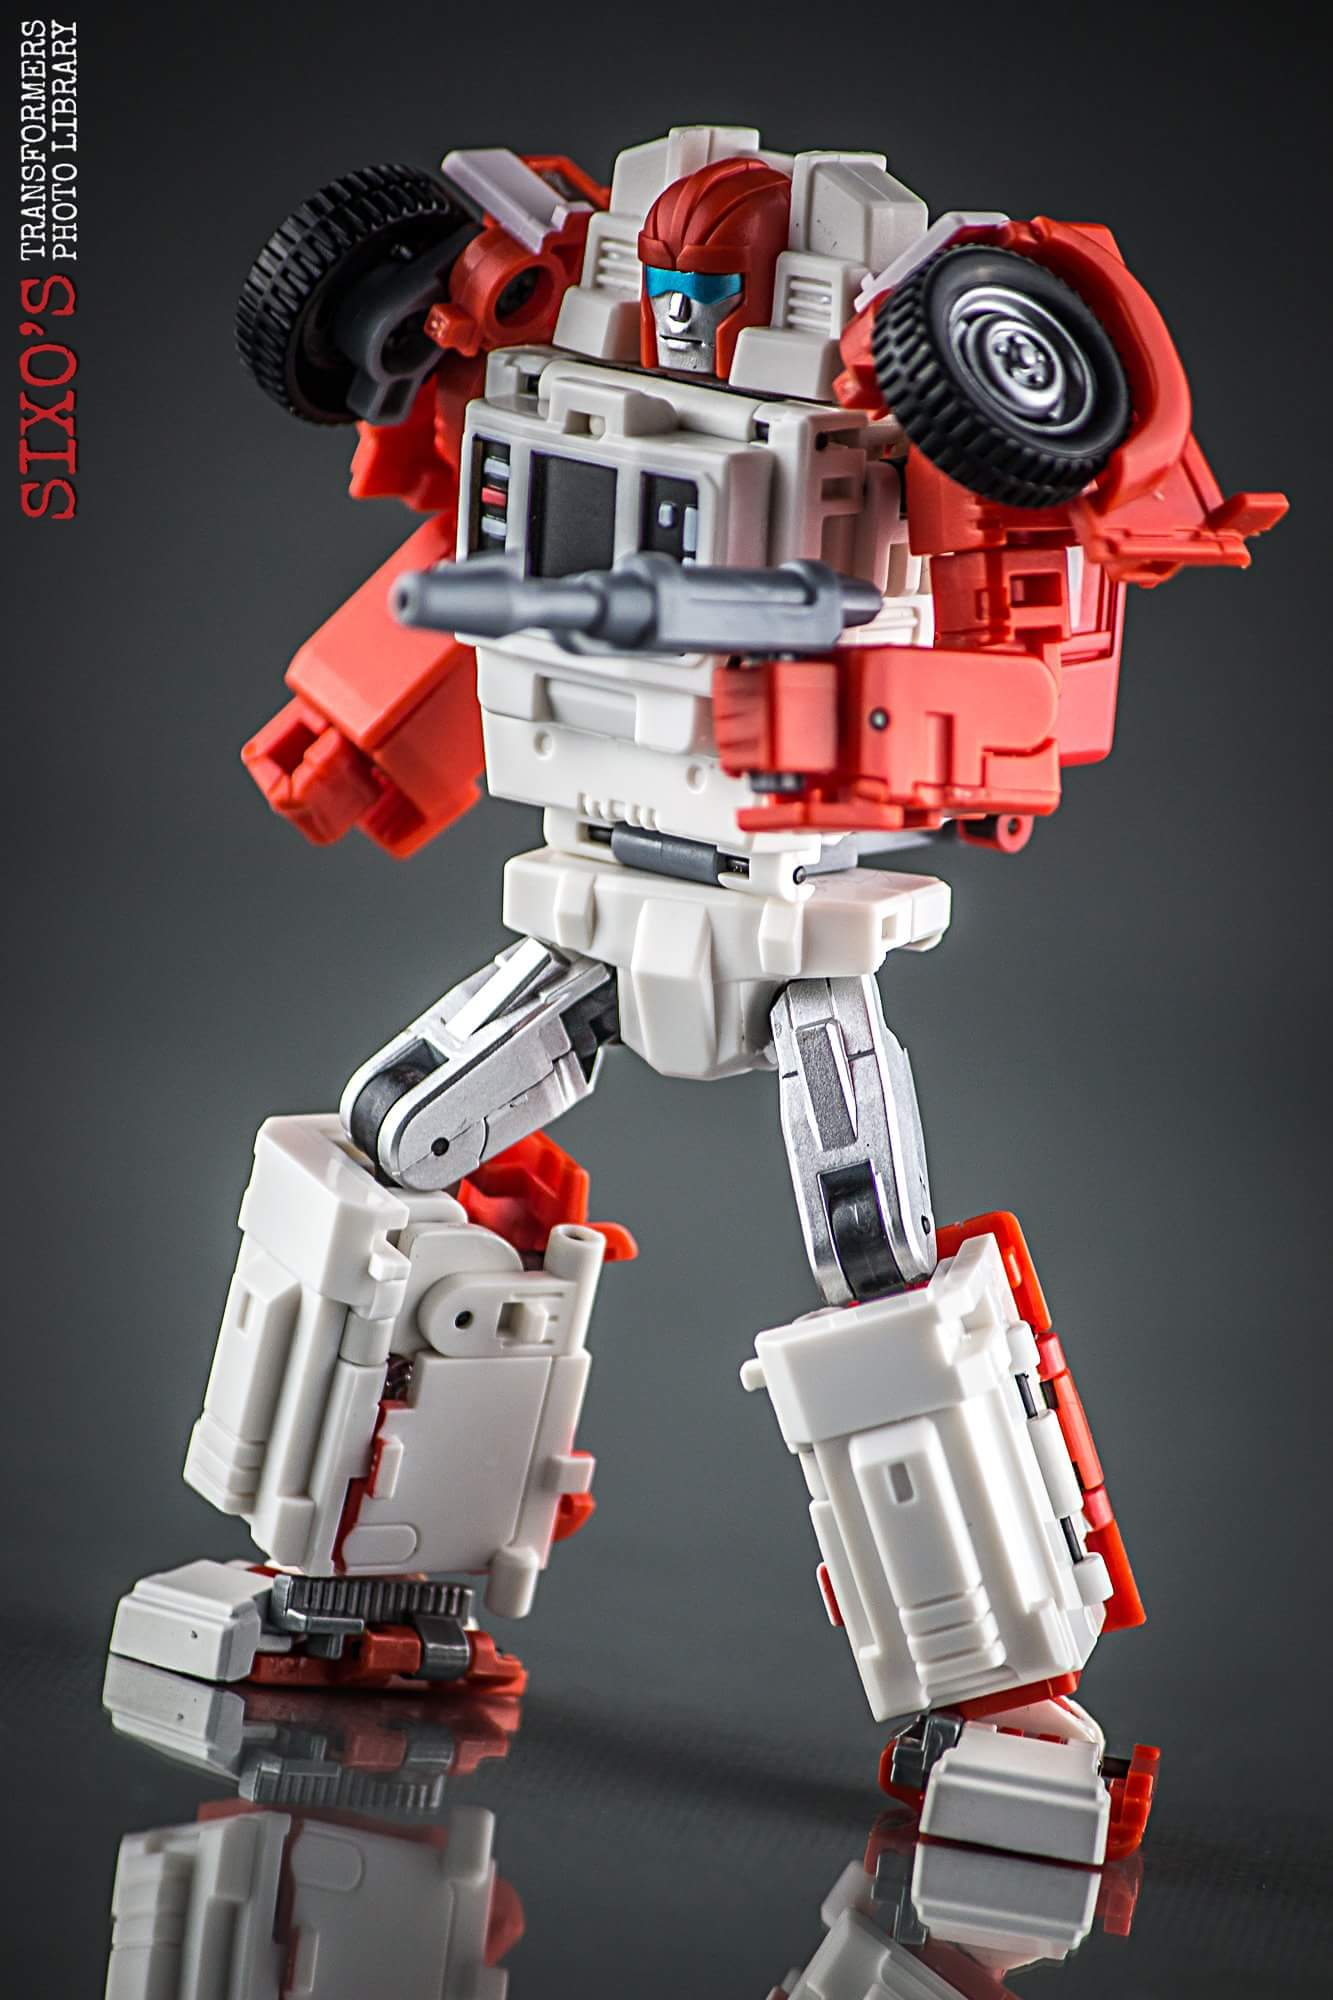 [BadCube] Produit Tiers - Minibots MP - Gamme OTS - Page 6 9r5na2Uu